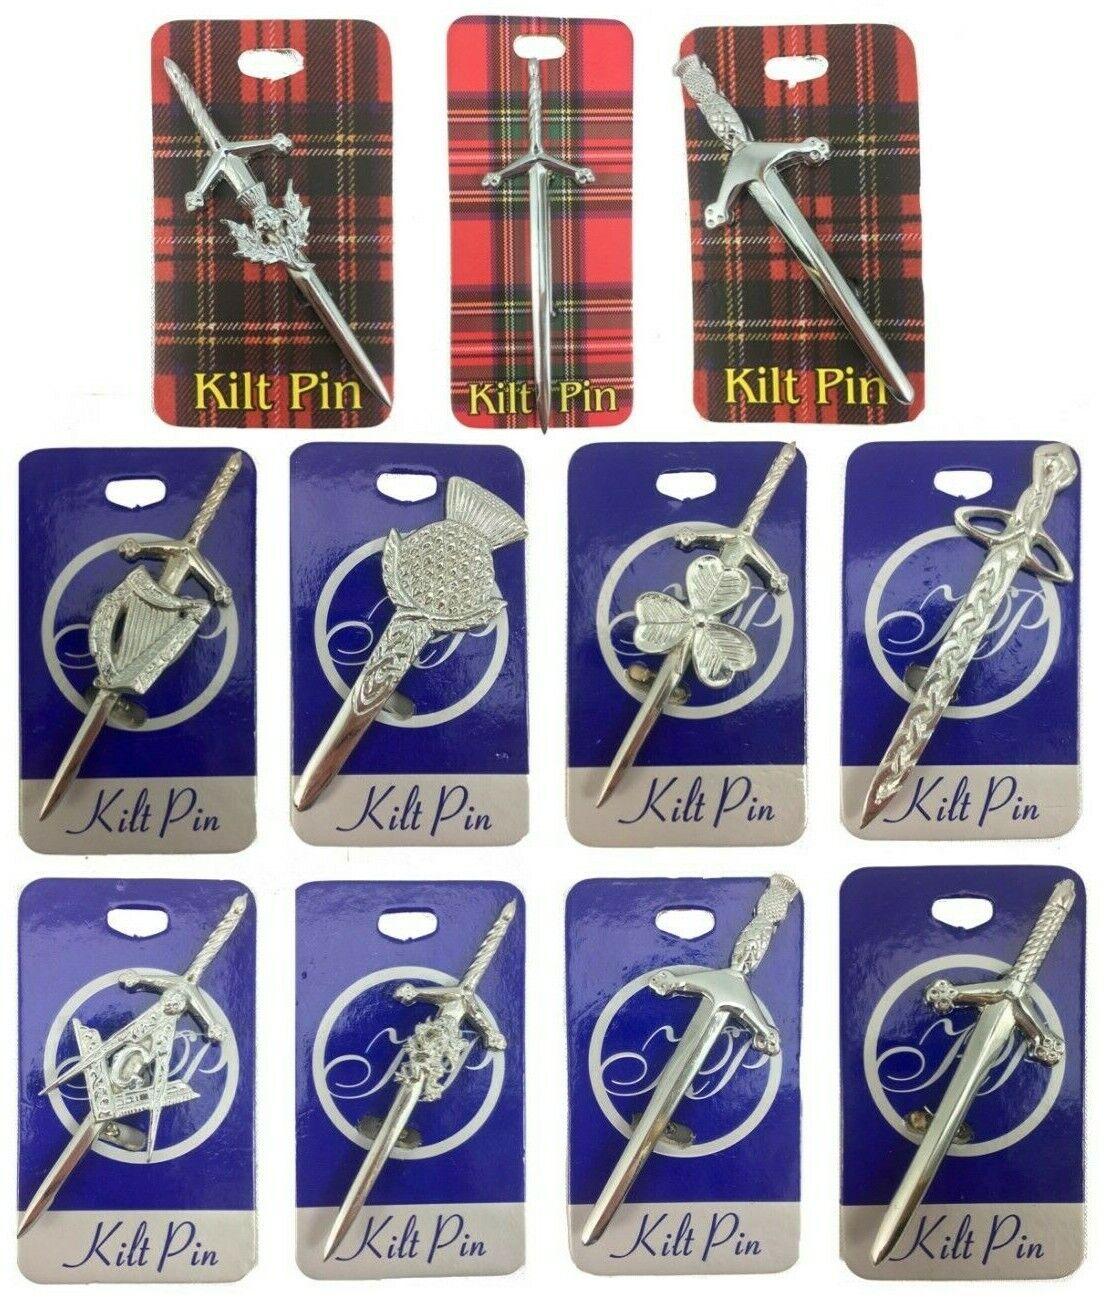 Scottish And Celtic Strong Kilt Pin For Any Heavy Kilt New Various Designs